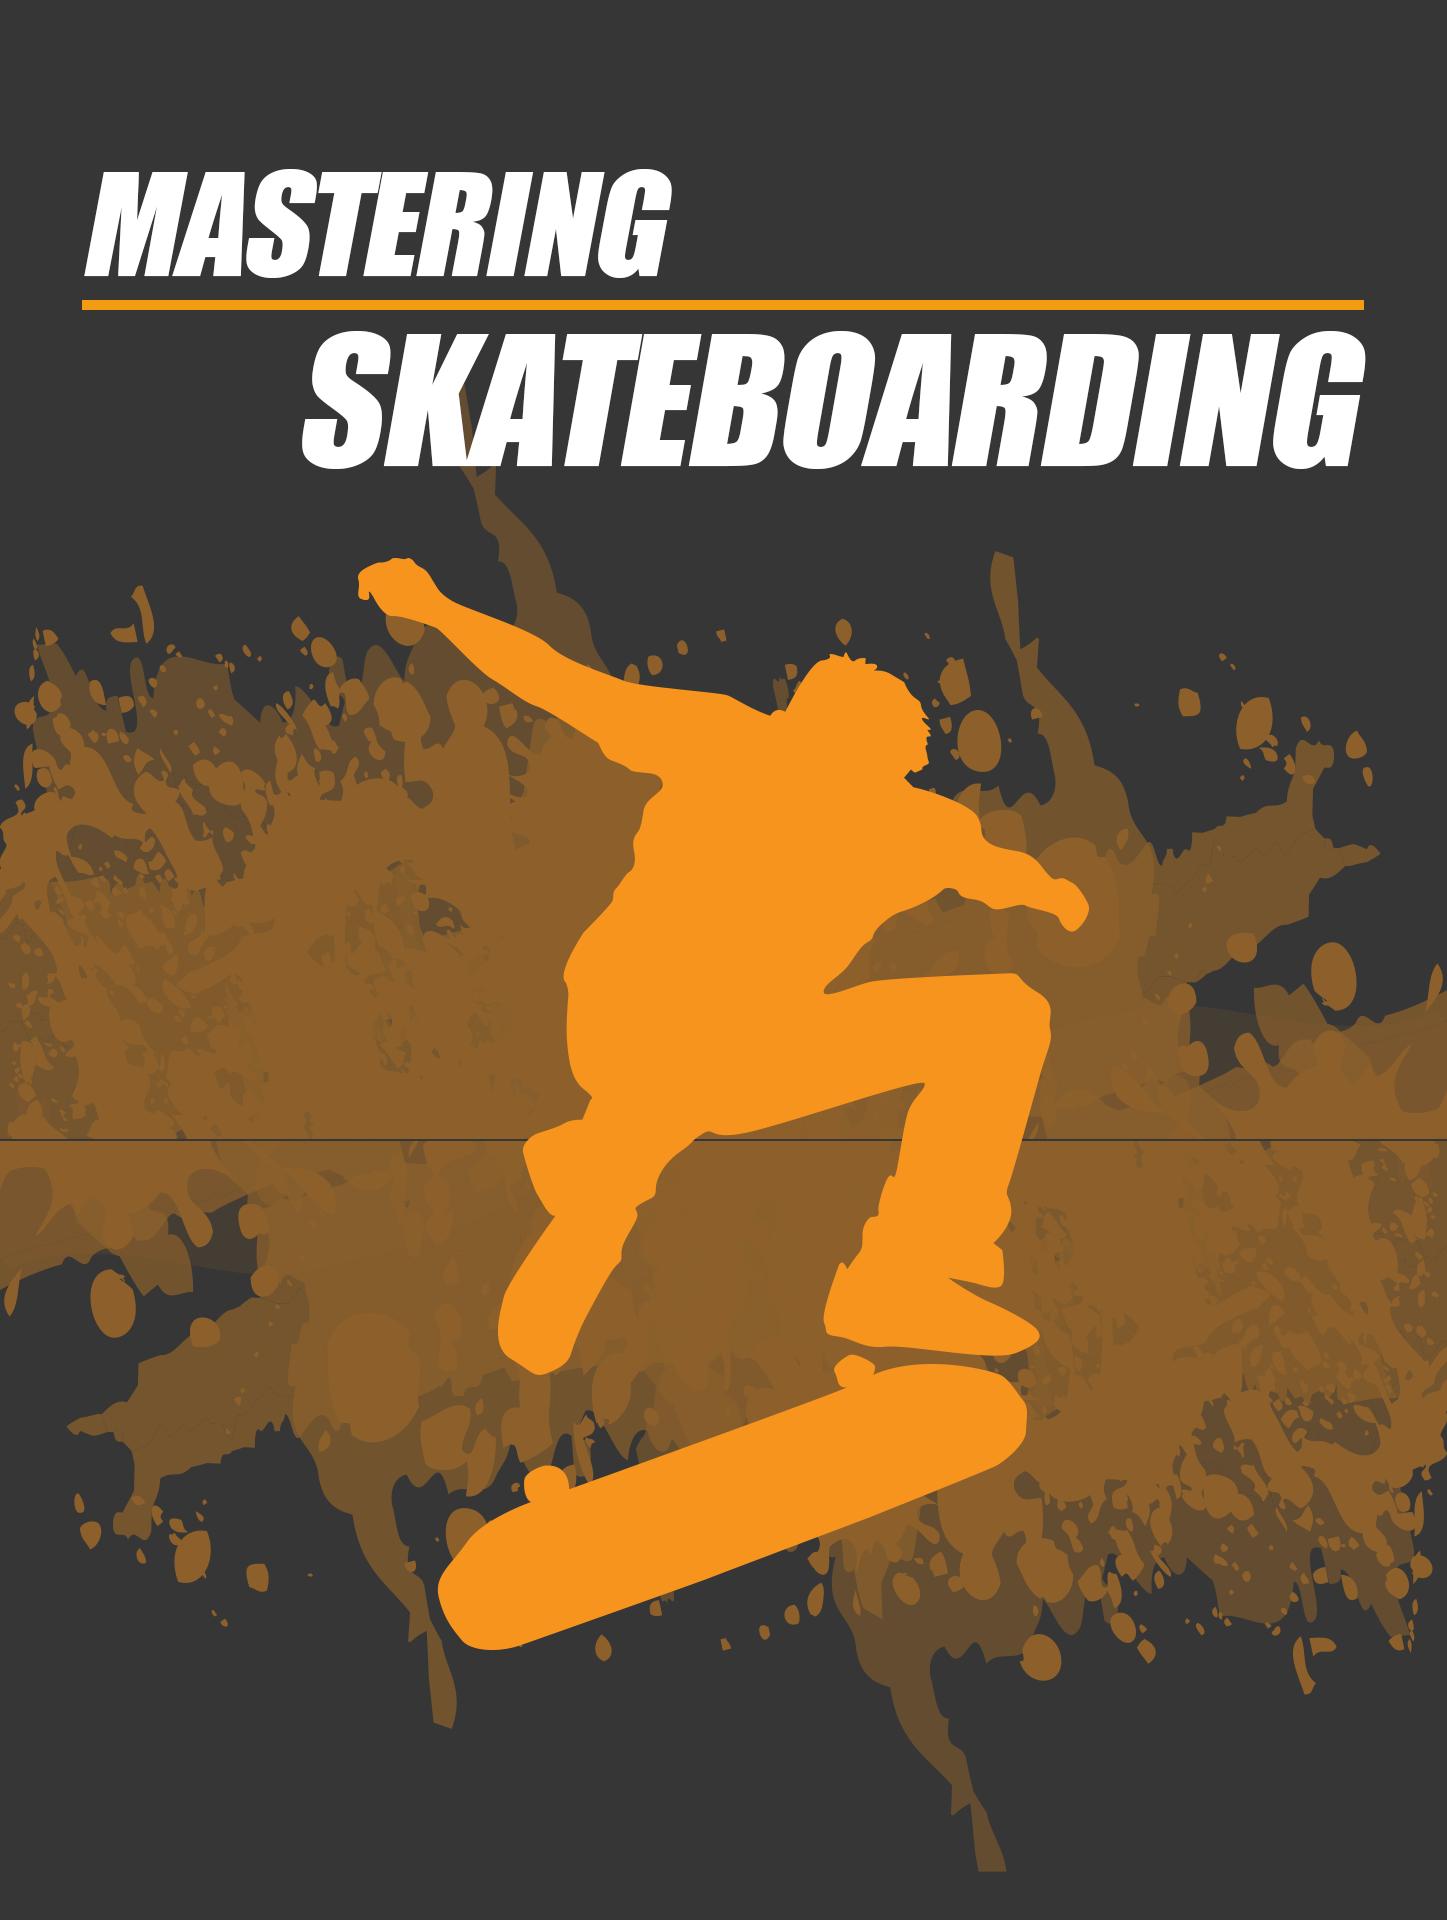 Mastering-Skateboarding